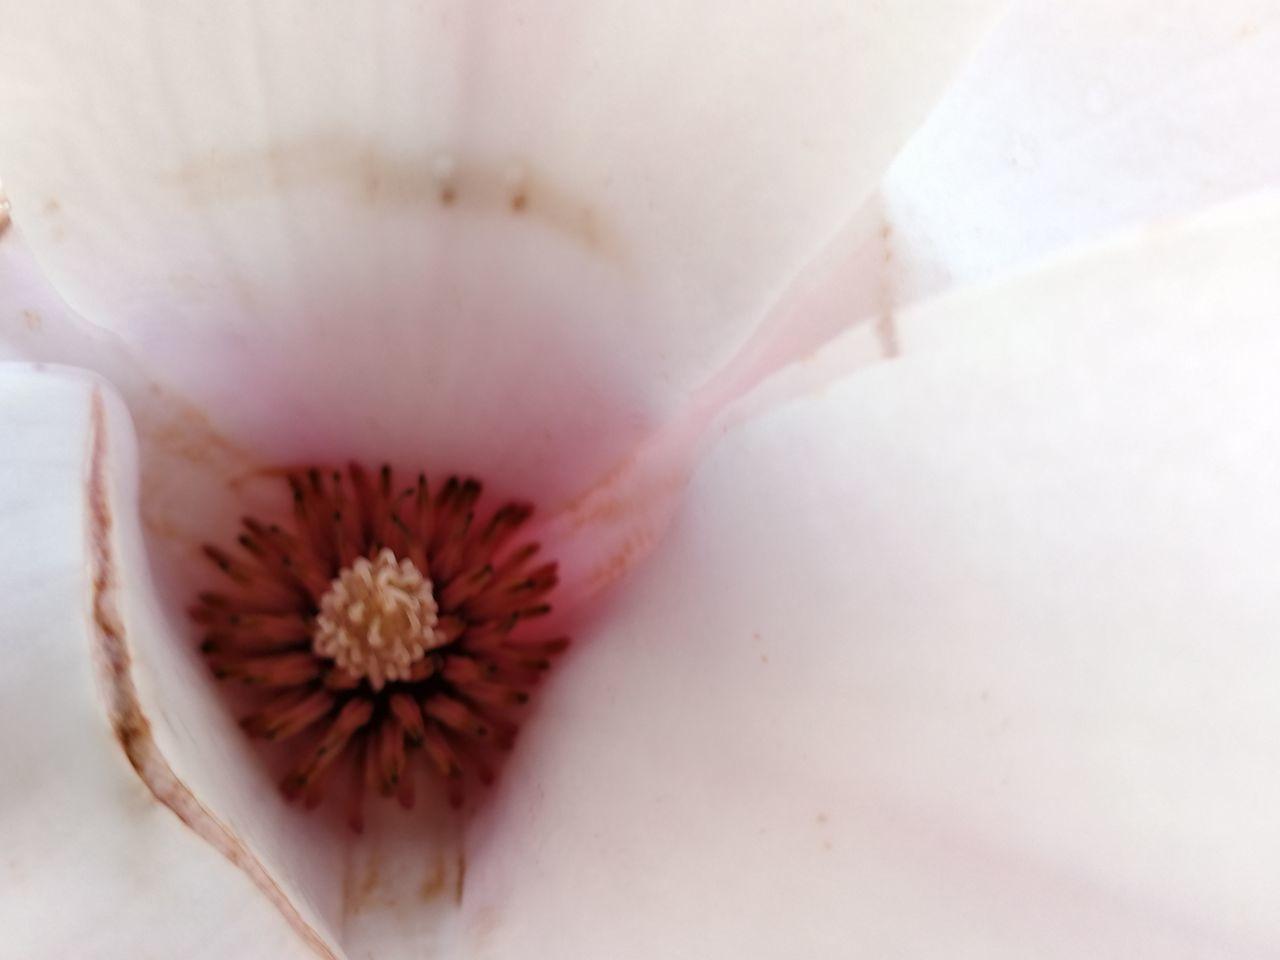 Spring Springtime Close-up No People Vscogrid VSCO Nature Outdoors Flower Flower Head Magnolia Magnolia_Blossom Details Of Nature Detail